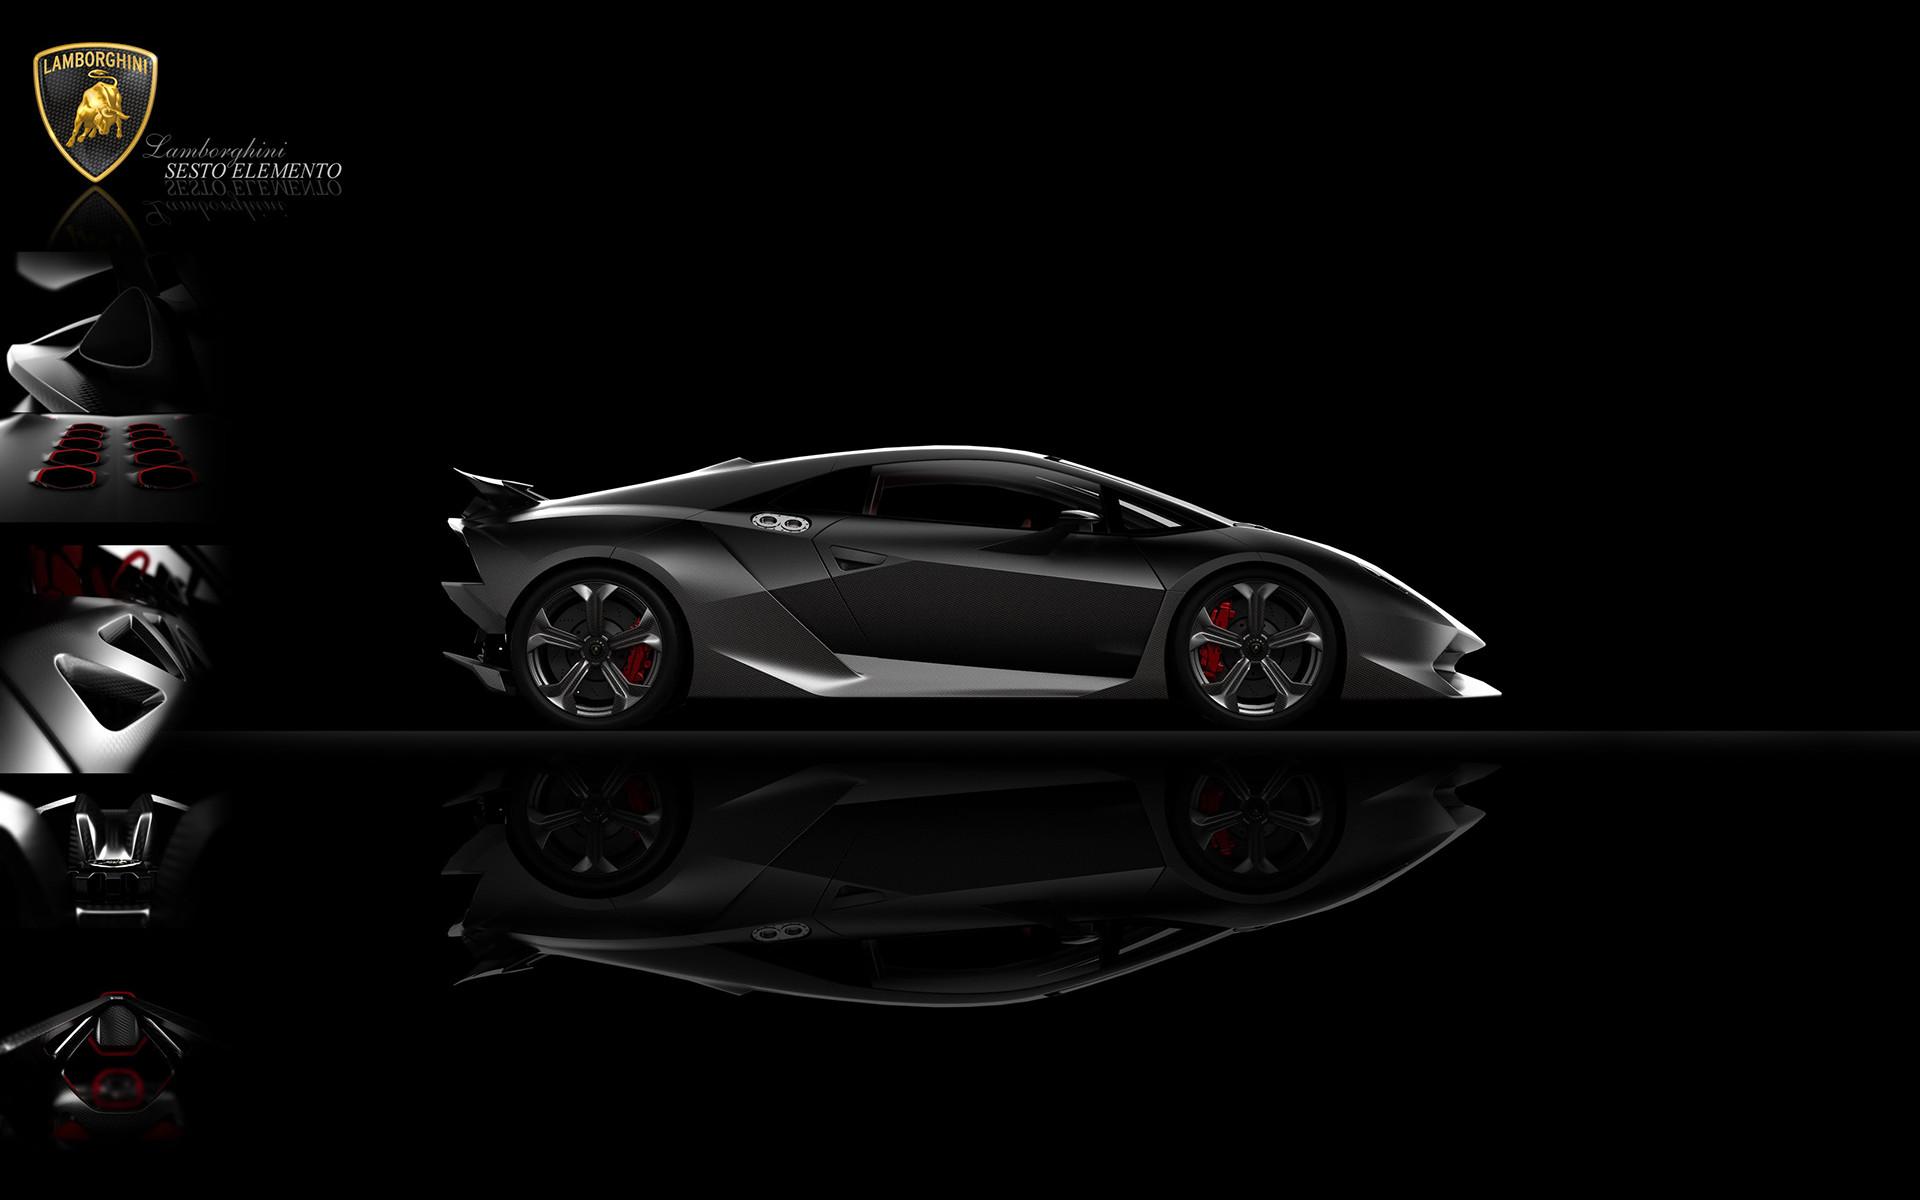 Superb Front Side View Of A Black Lamborghini Sesto Elemento Wallpaper 1920x1080